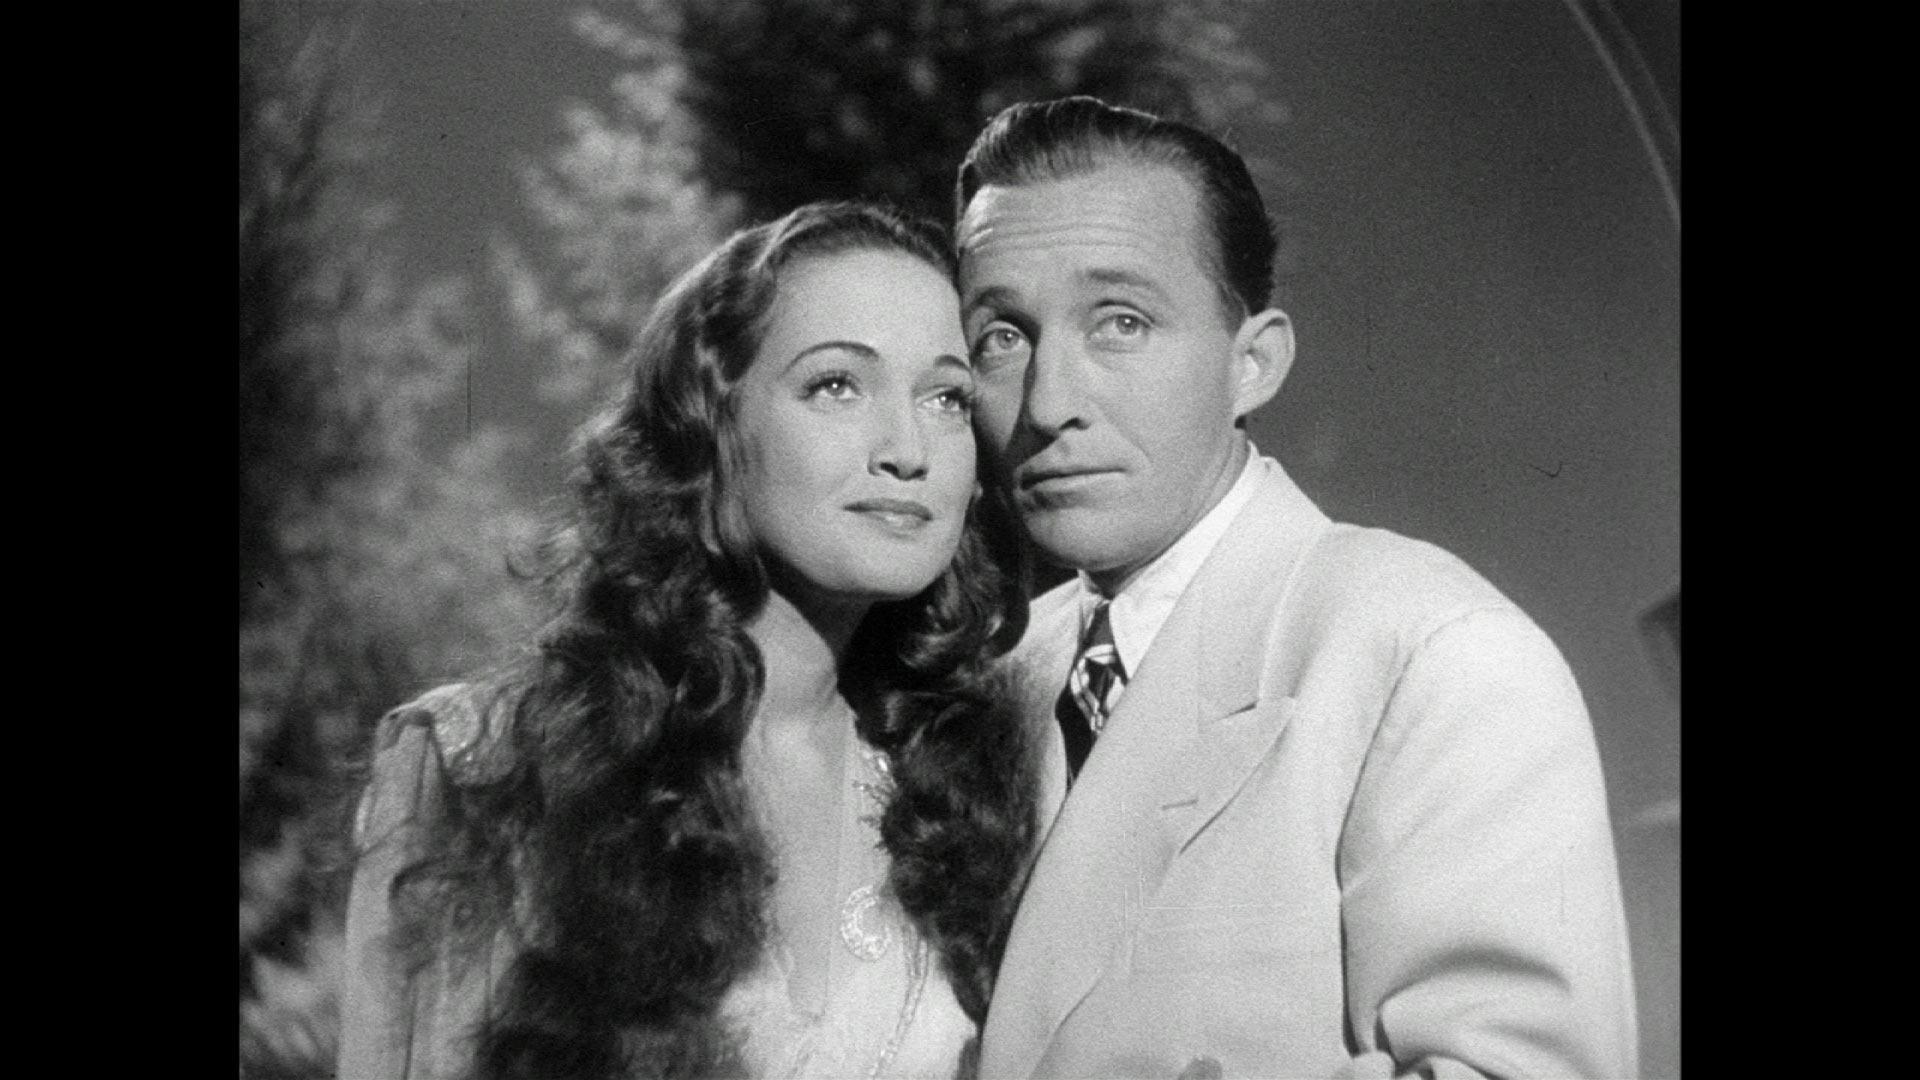 Bing Crosby's Style of Singing